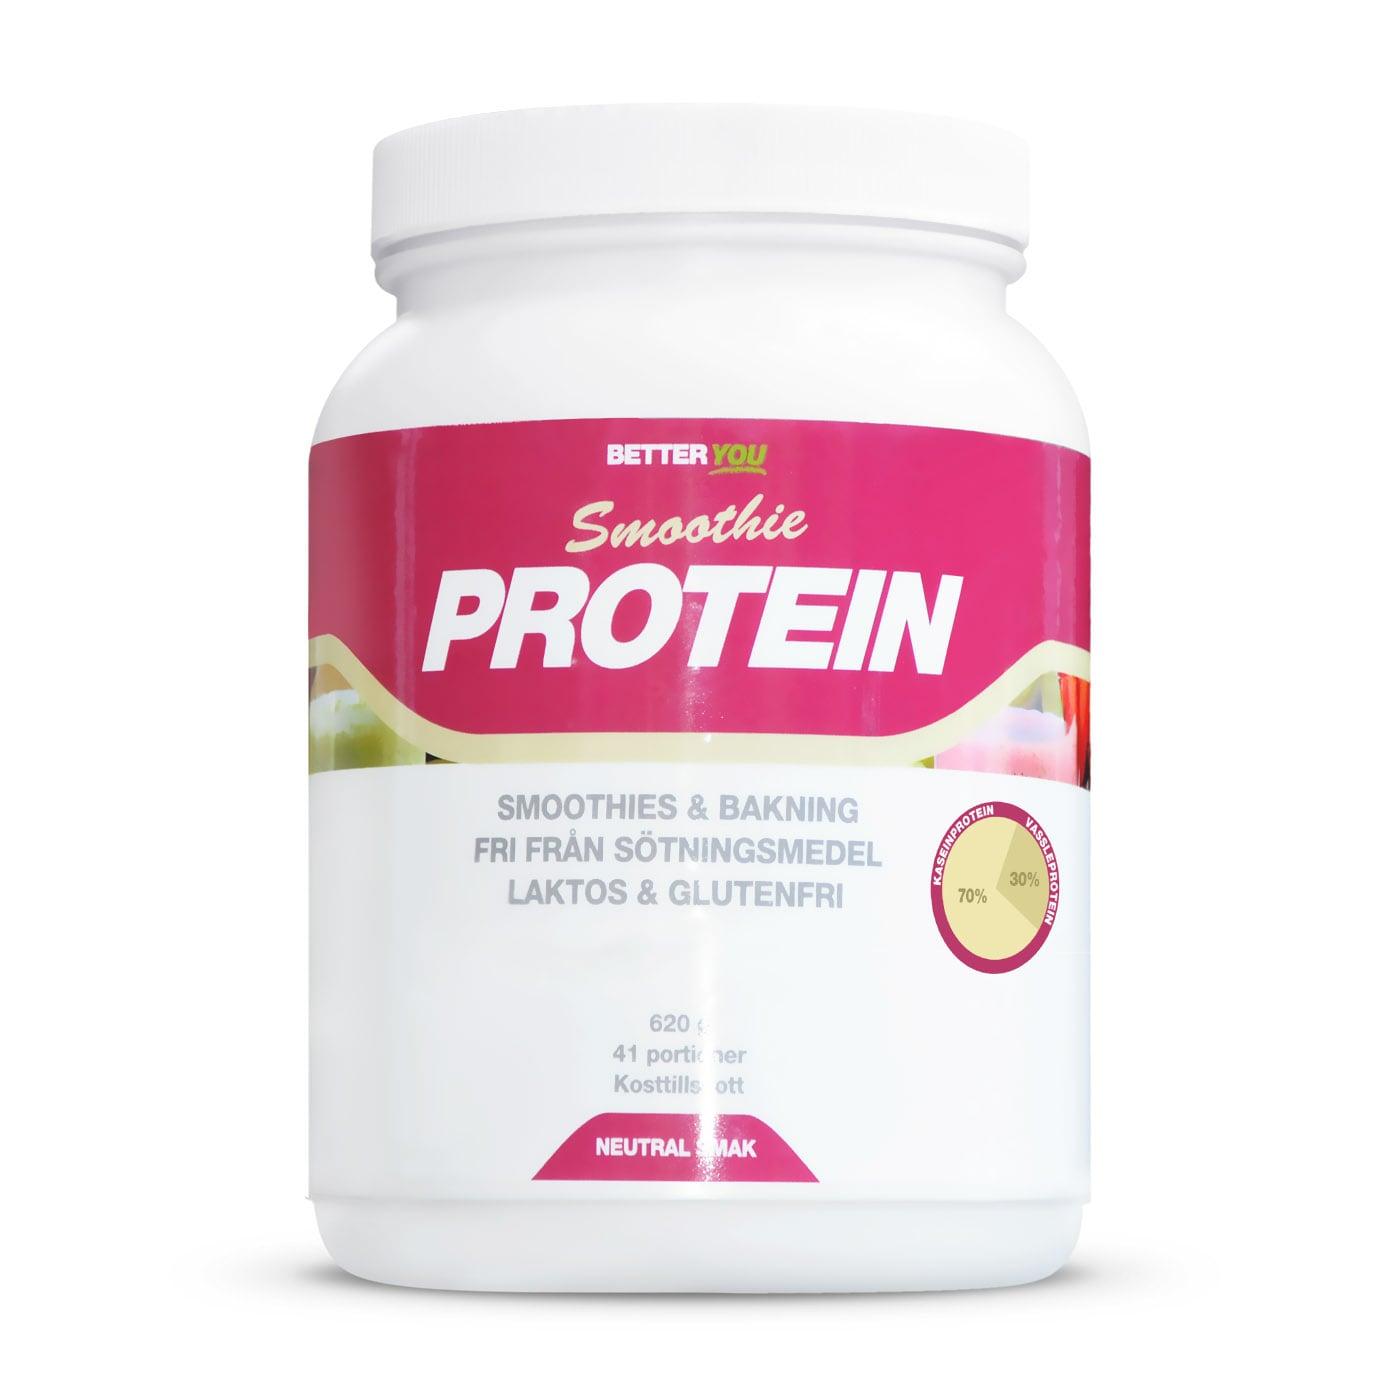 Smoothie Protein - Naturell